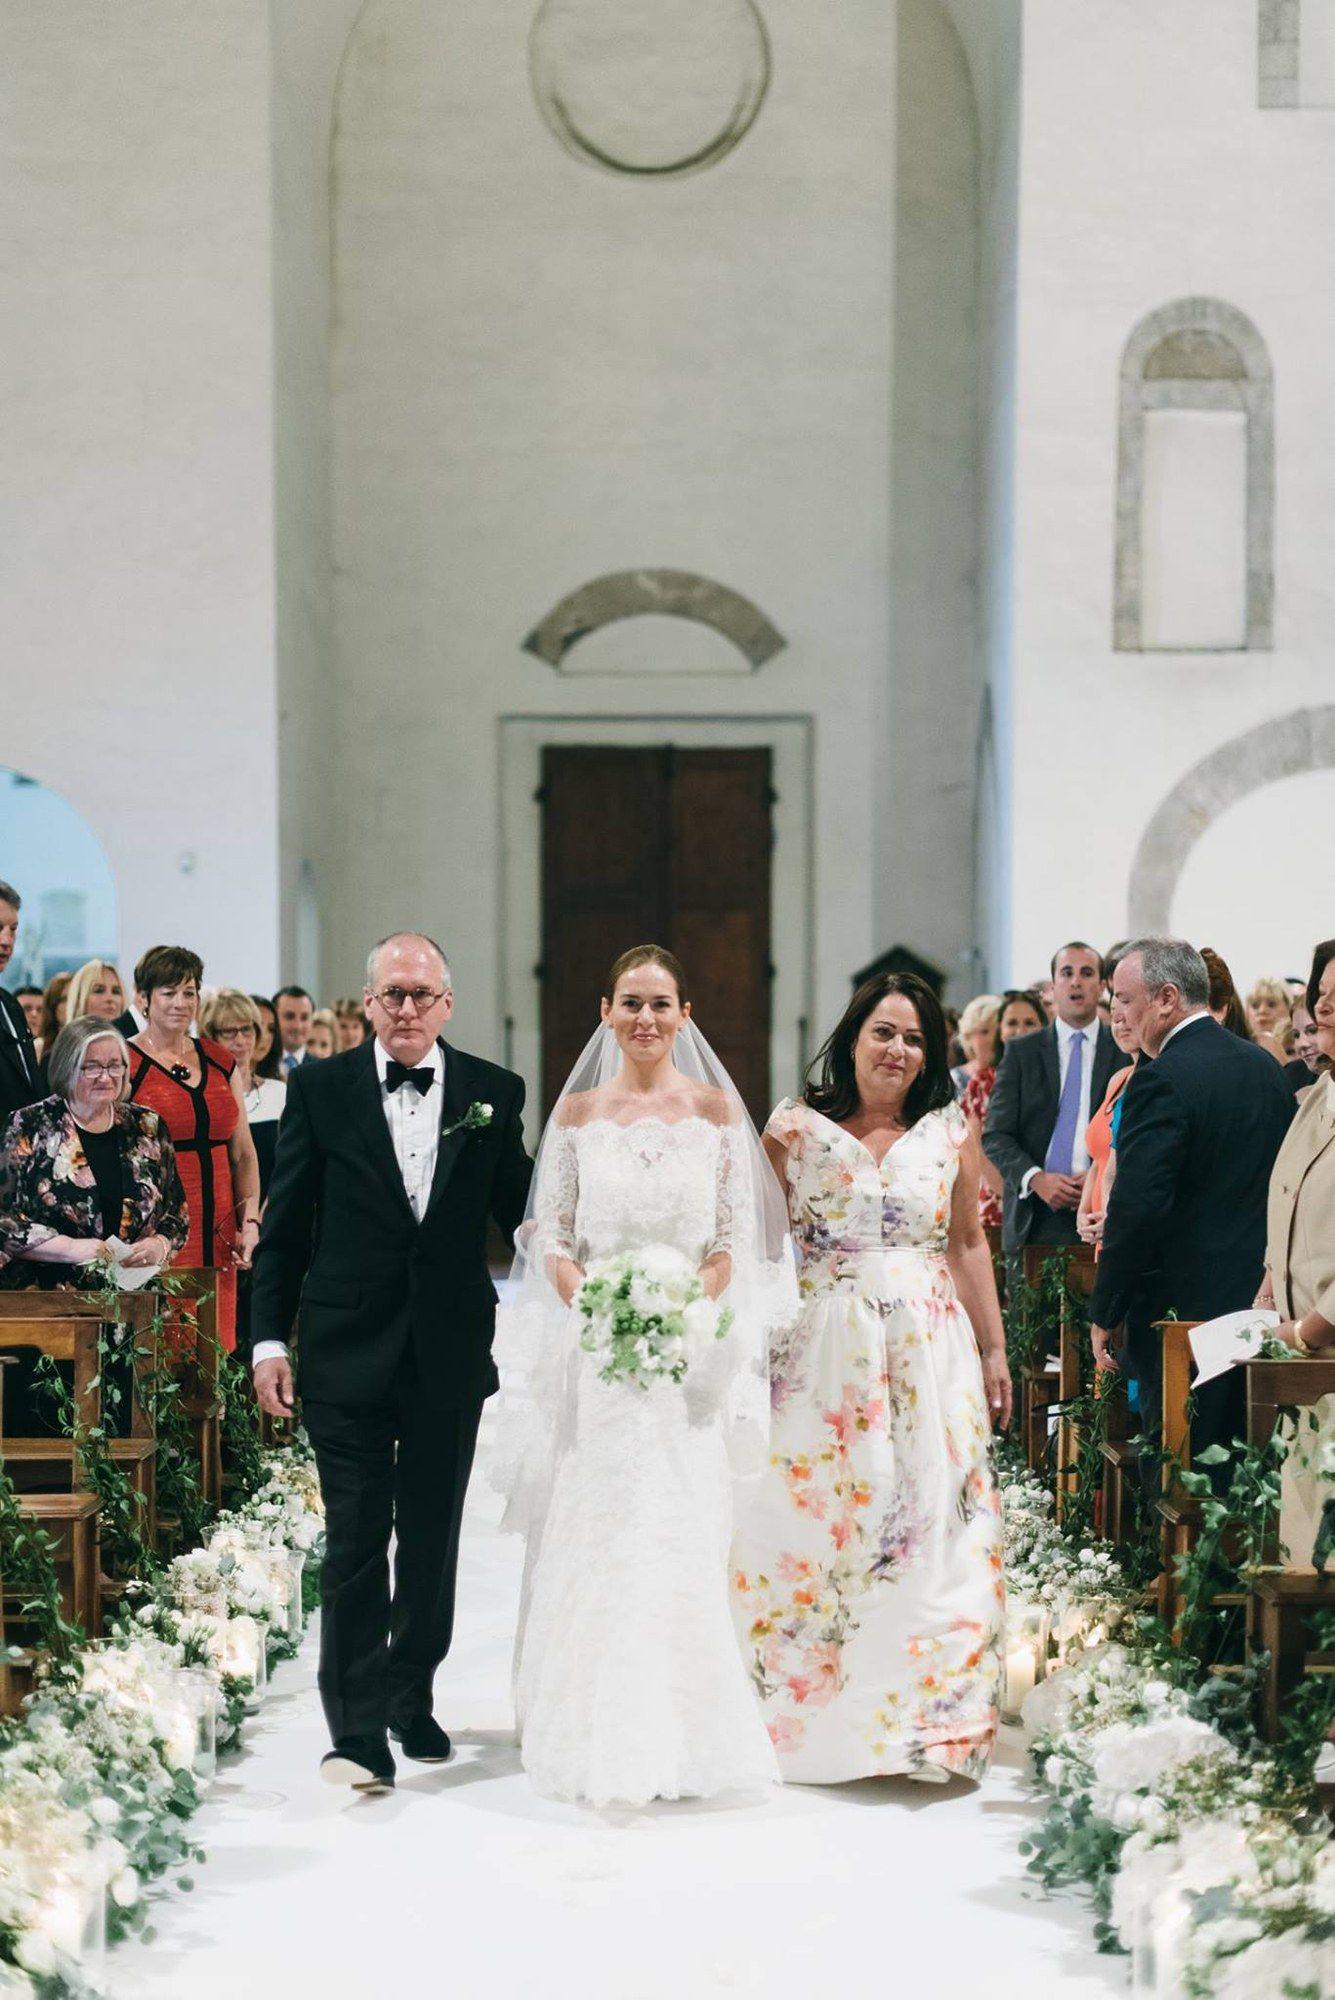 Meg Scanlon And Michael Mcgillen S Intimate Destination Wedding In Tuscany Italy Wedding Dress Vogue Wedding Tuscany Wedding